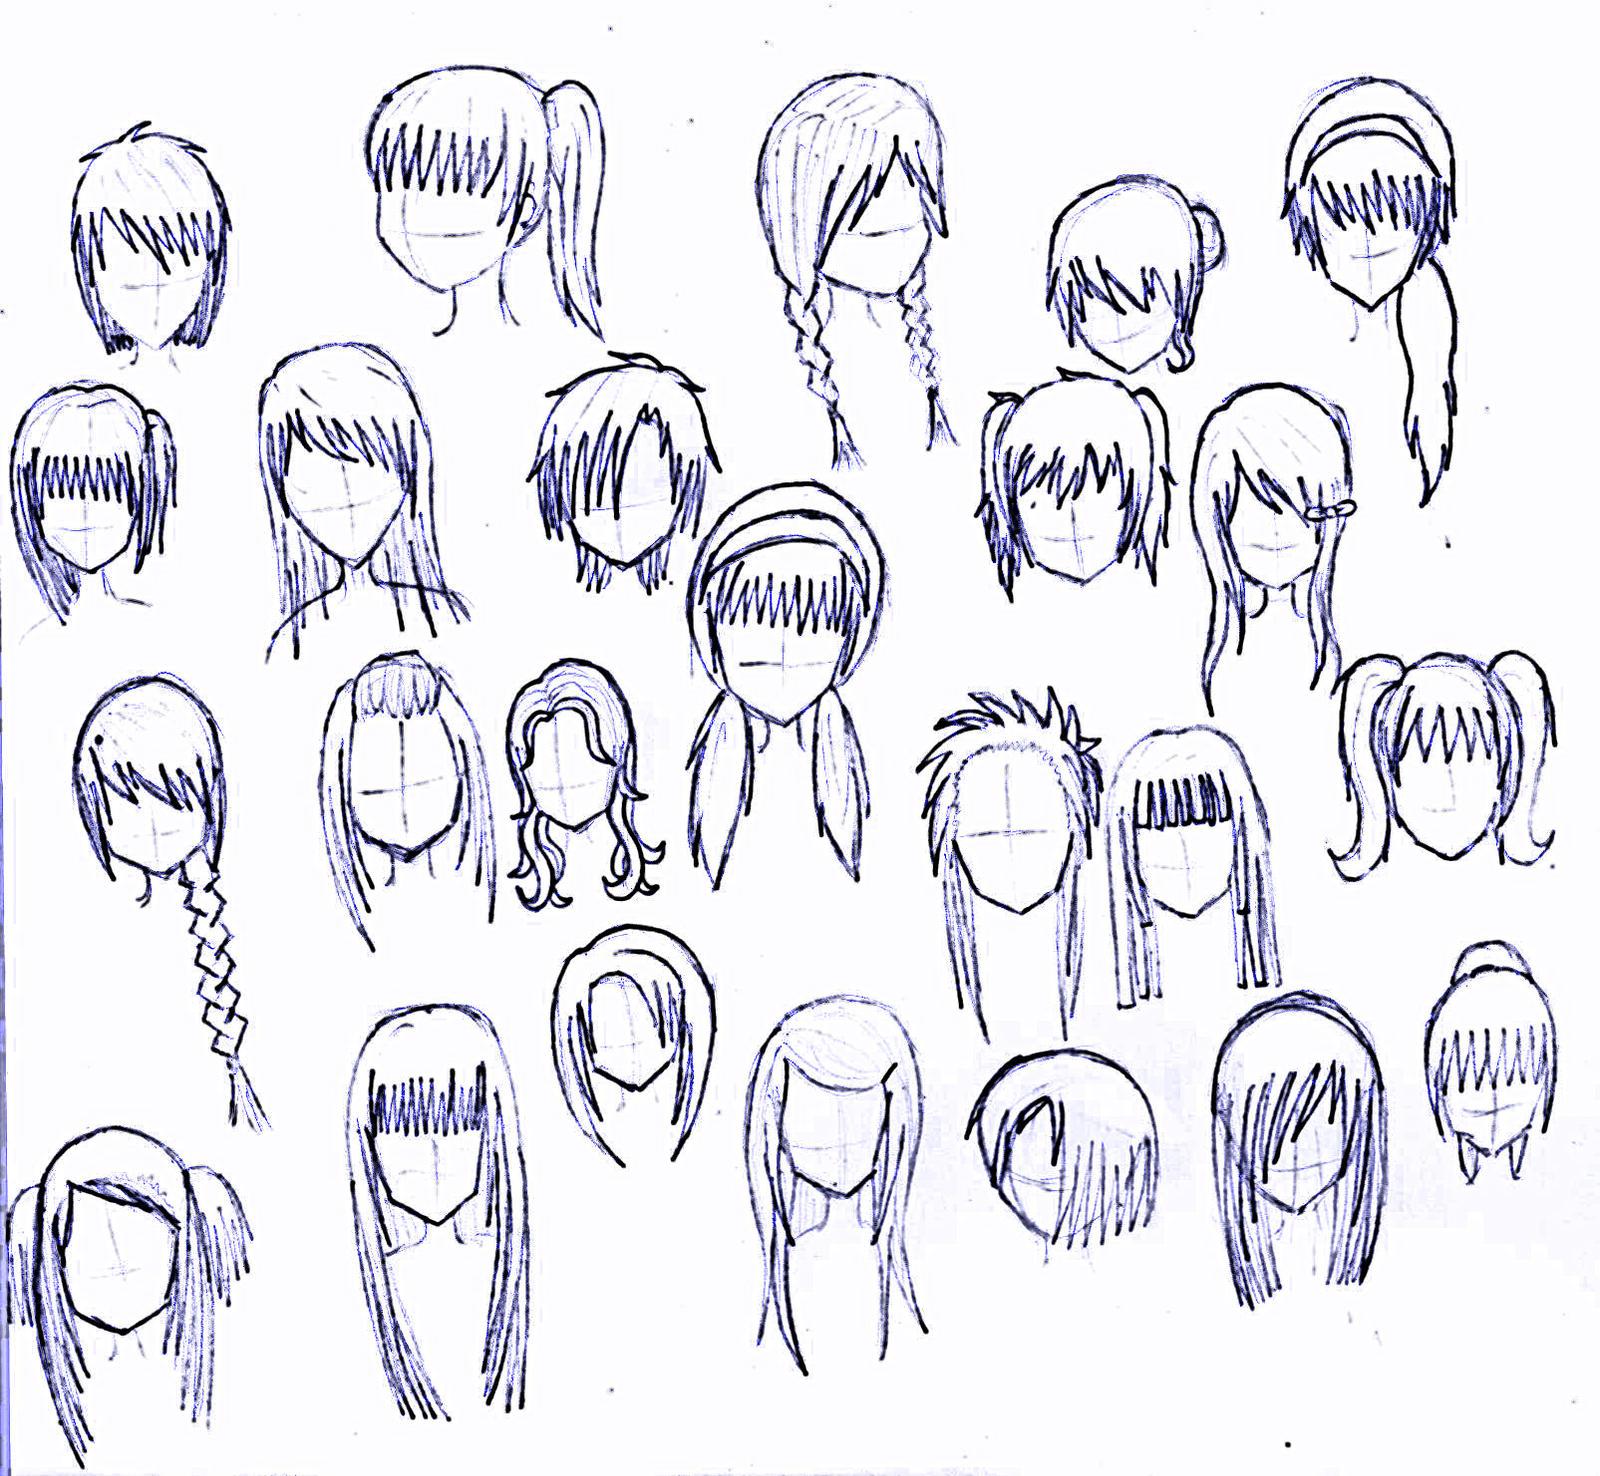 24 girls hairstyles by MatsudaKeiko on DeviantArt